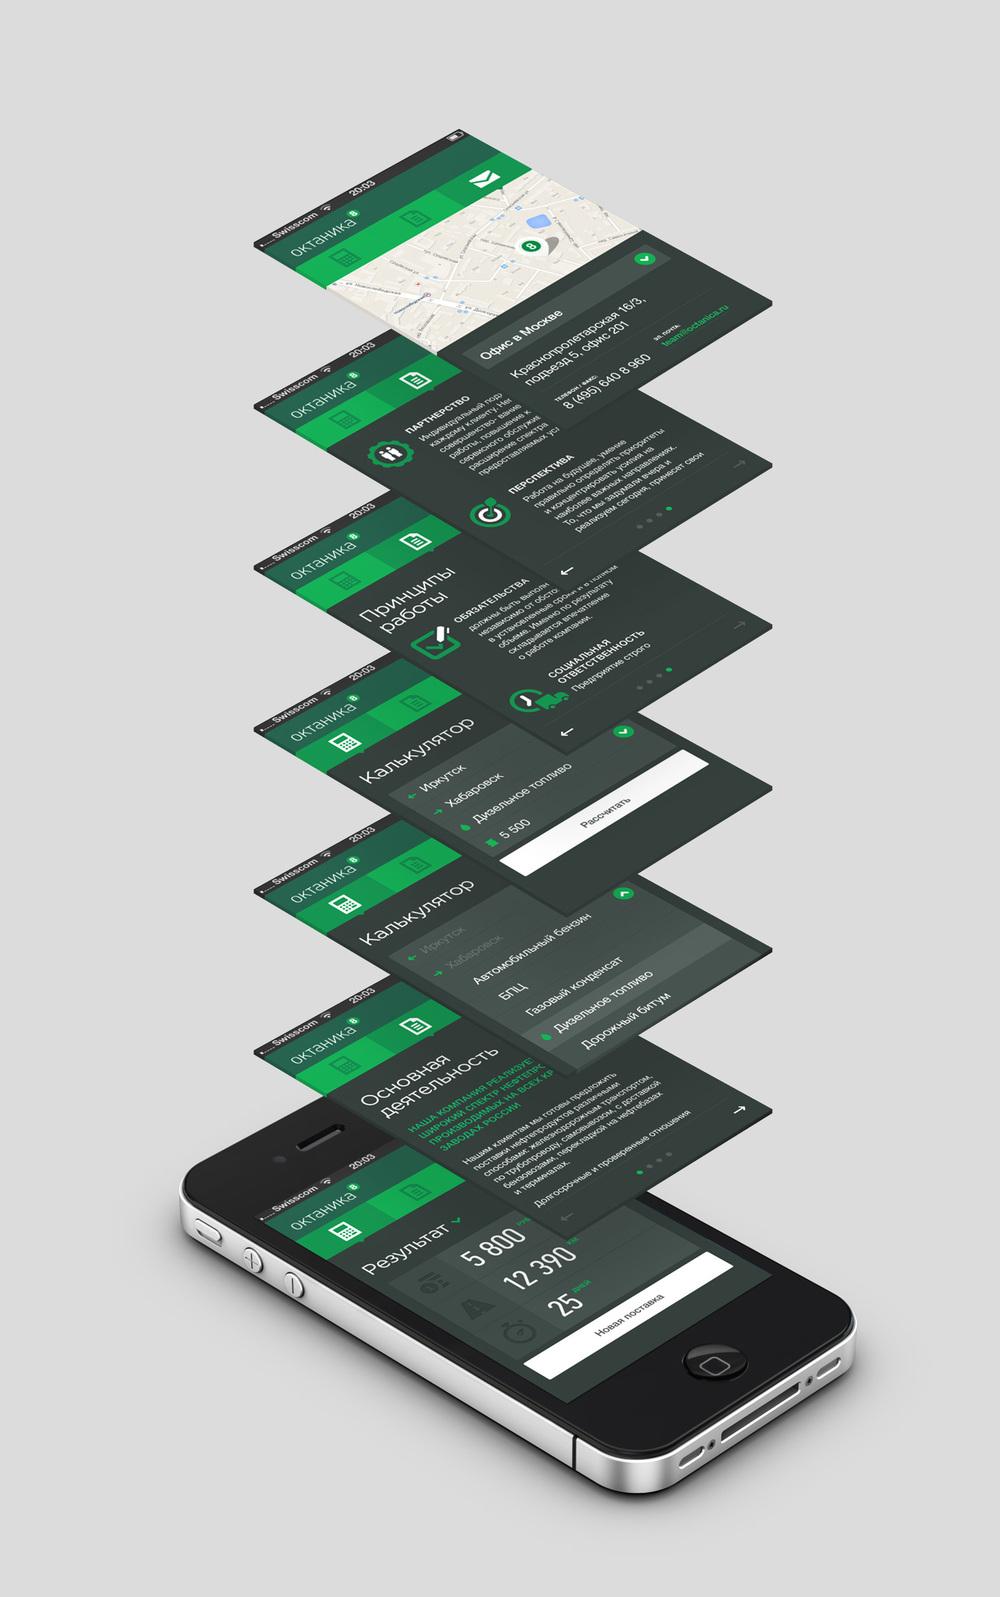 octanica_mobile.jpg